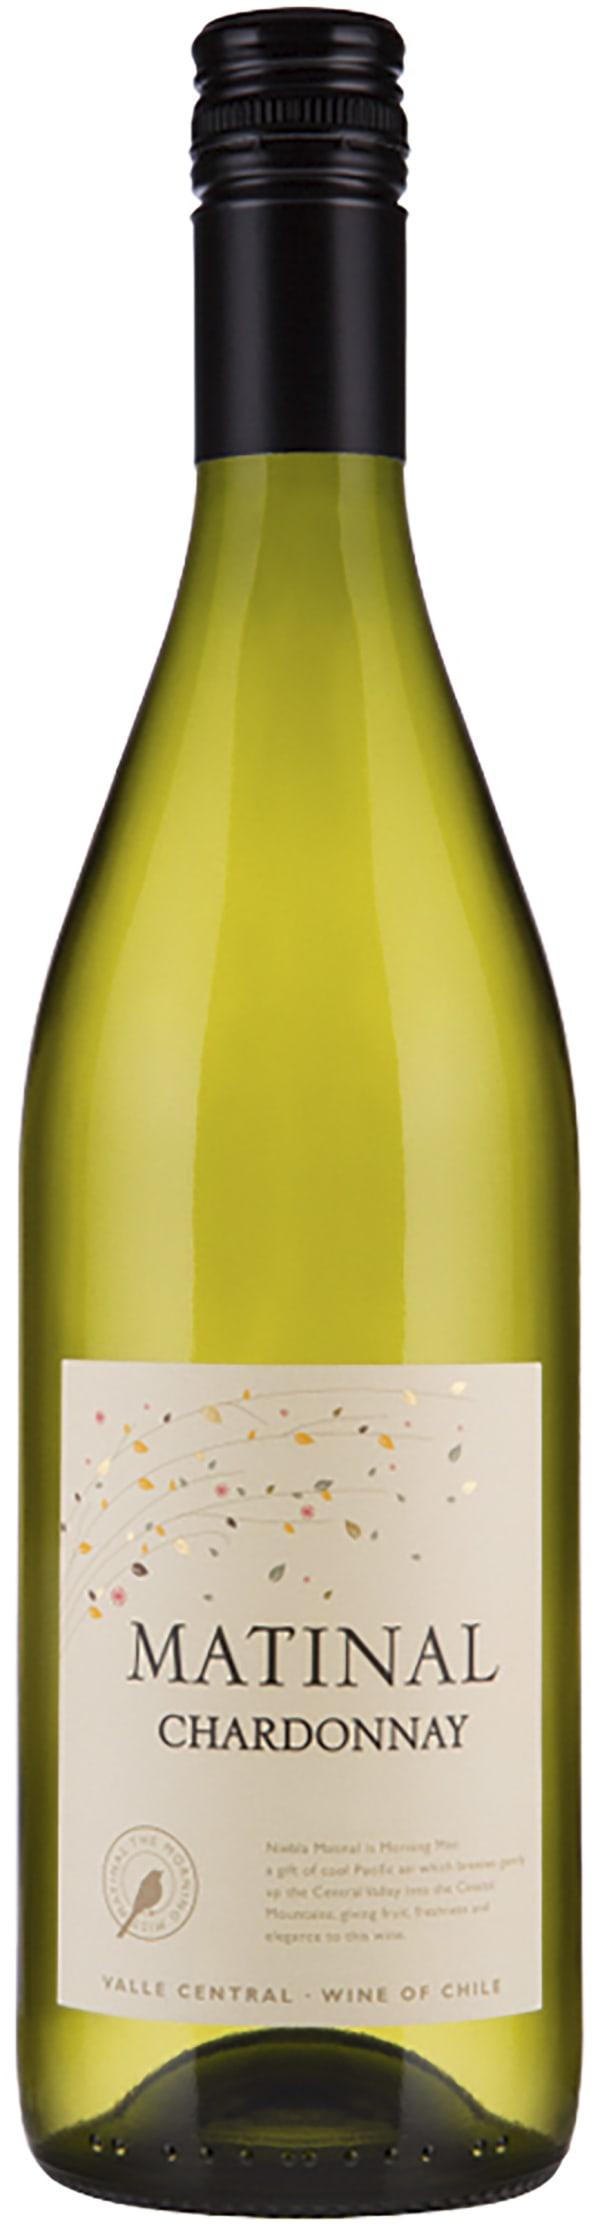 Fray Leon Matinal Chardonnay 2017